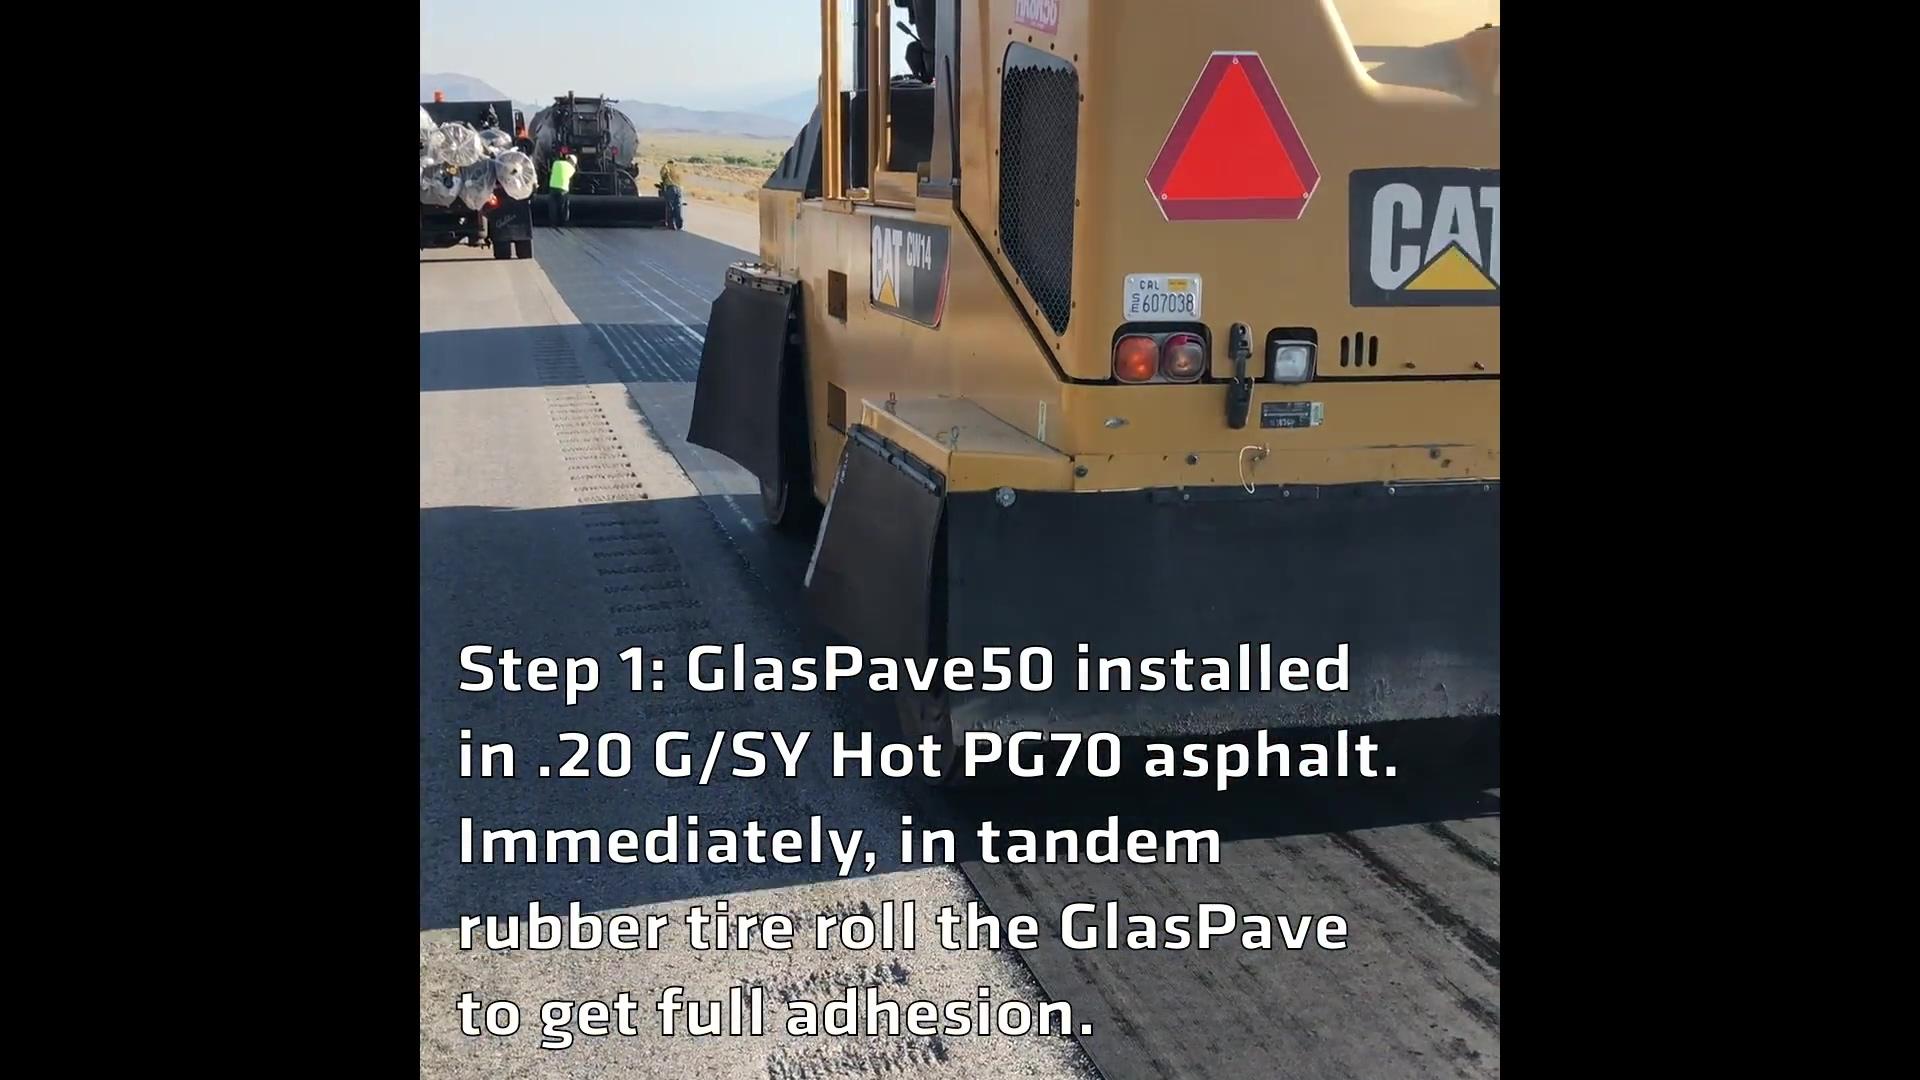 Tensar-Interlayers-GlasPave50-Caltrans-Blackrock-Installation-Video-120518